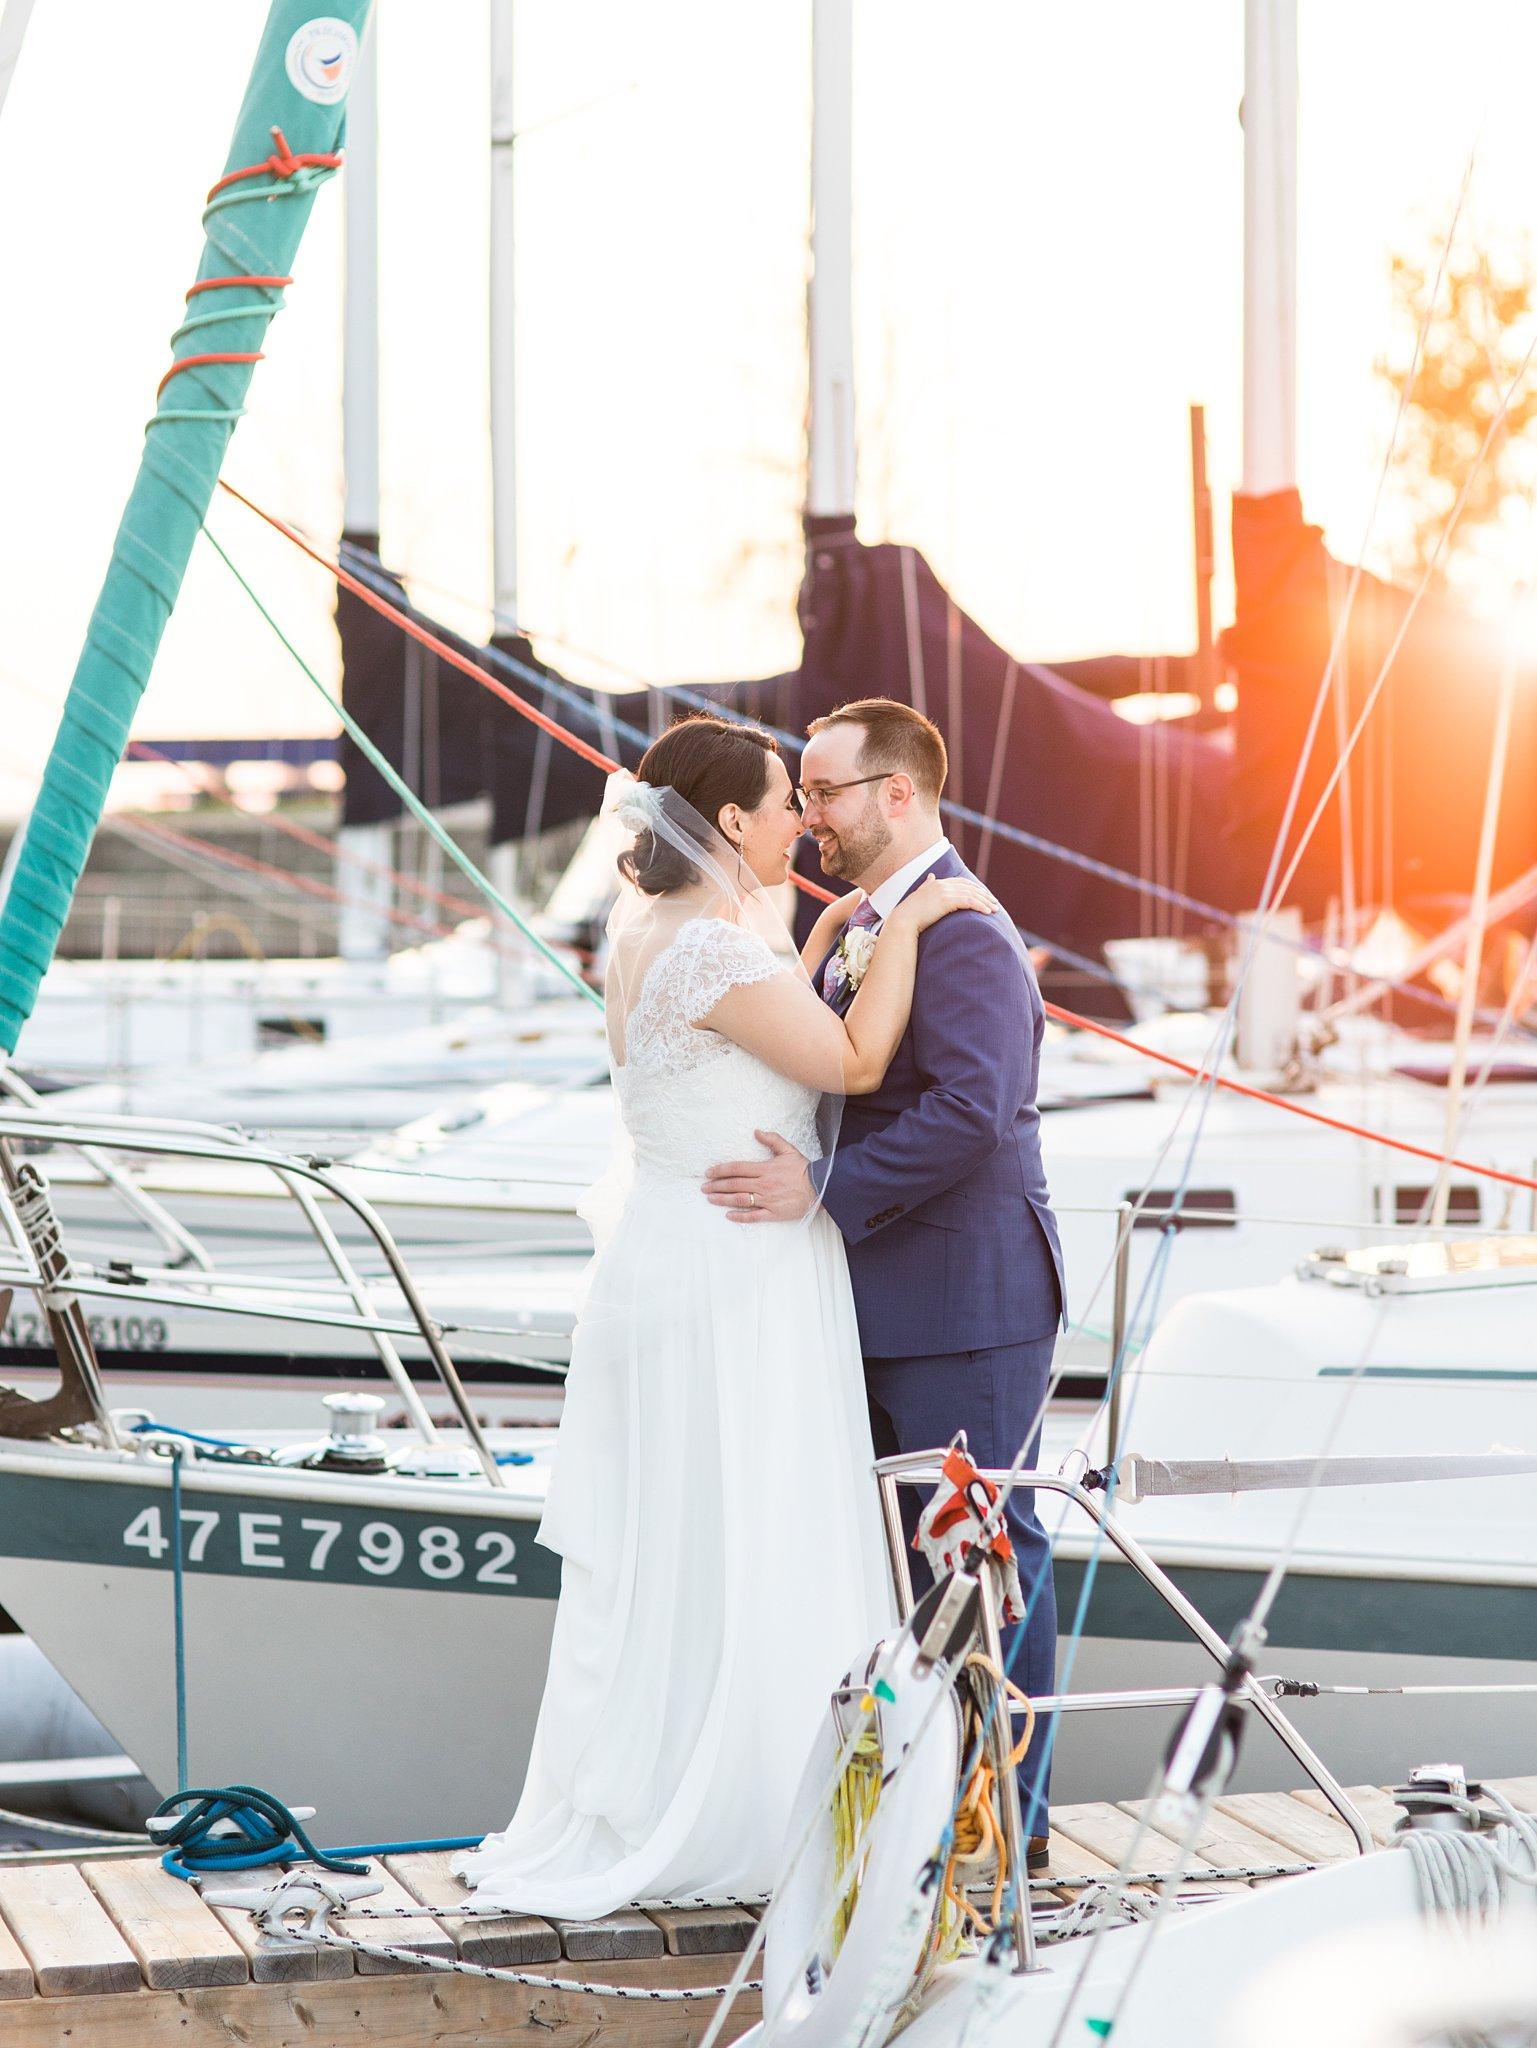 Sunset photos by boats, Britannia Yacht Club Wedding Photos, Amy Pinder Photography